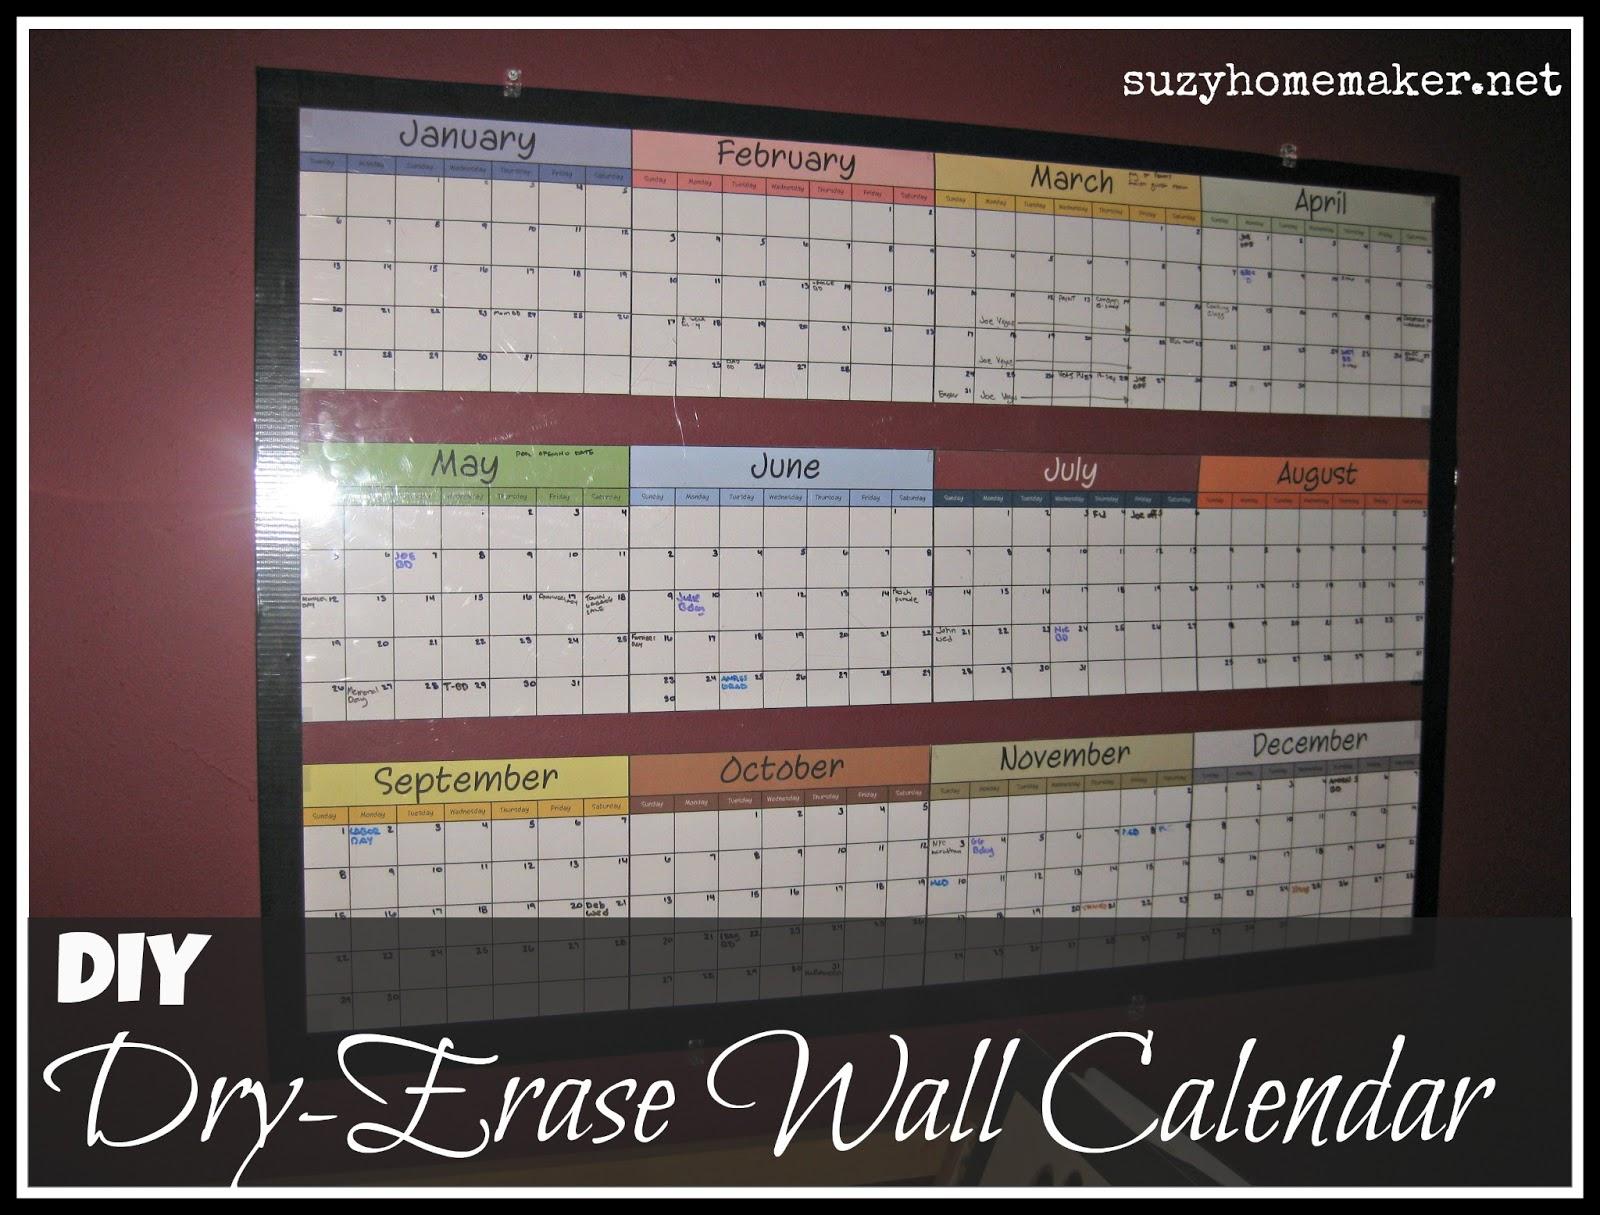 Year Calendar Diy : Diy dry erase wall calendar suzy co